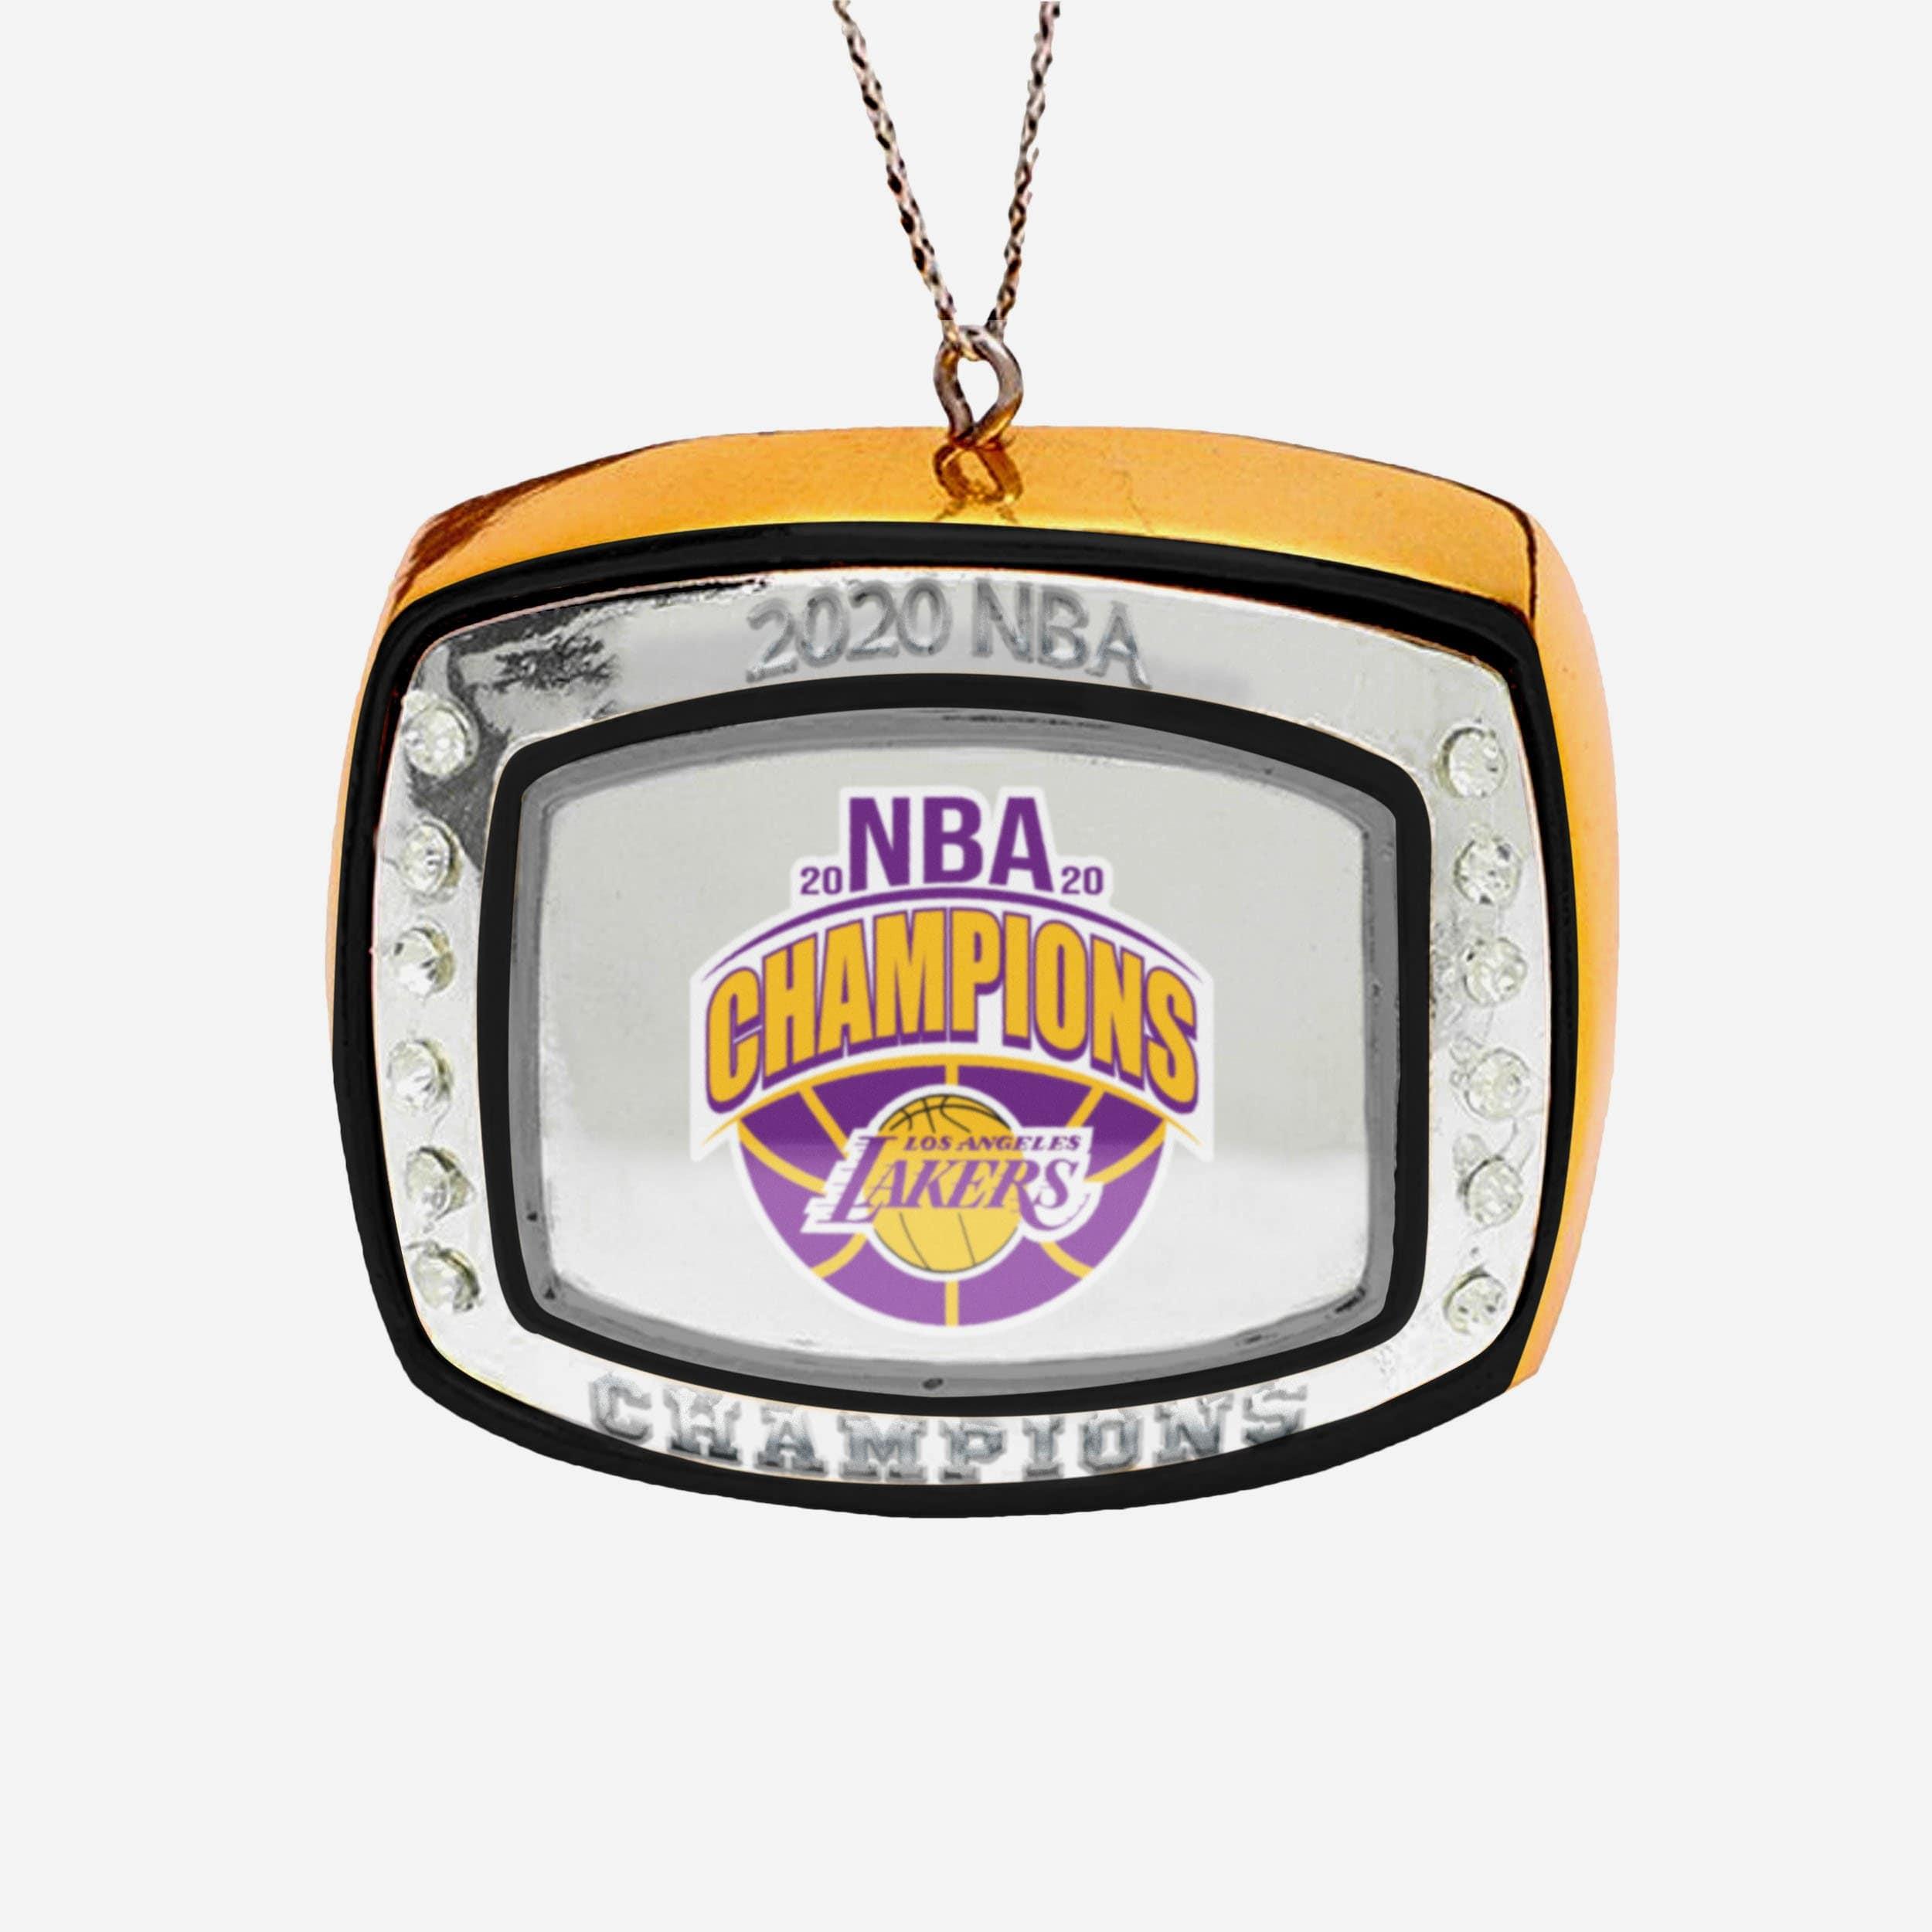 FOCO Los Angeles Lakers 2020 NBA Champions Ring Ornament